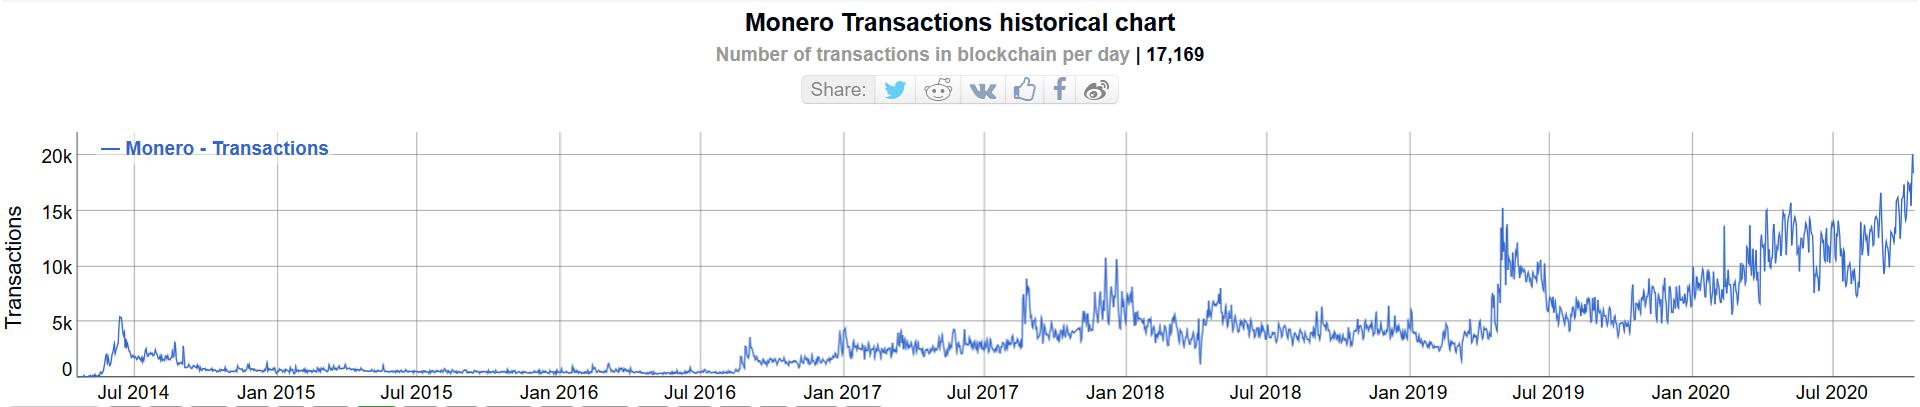 Monero daily transaction chart